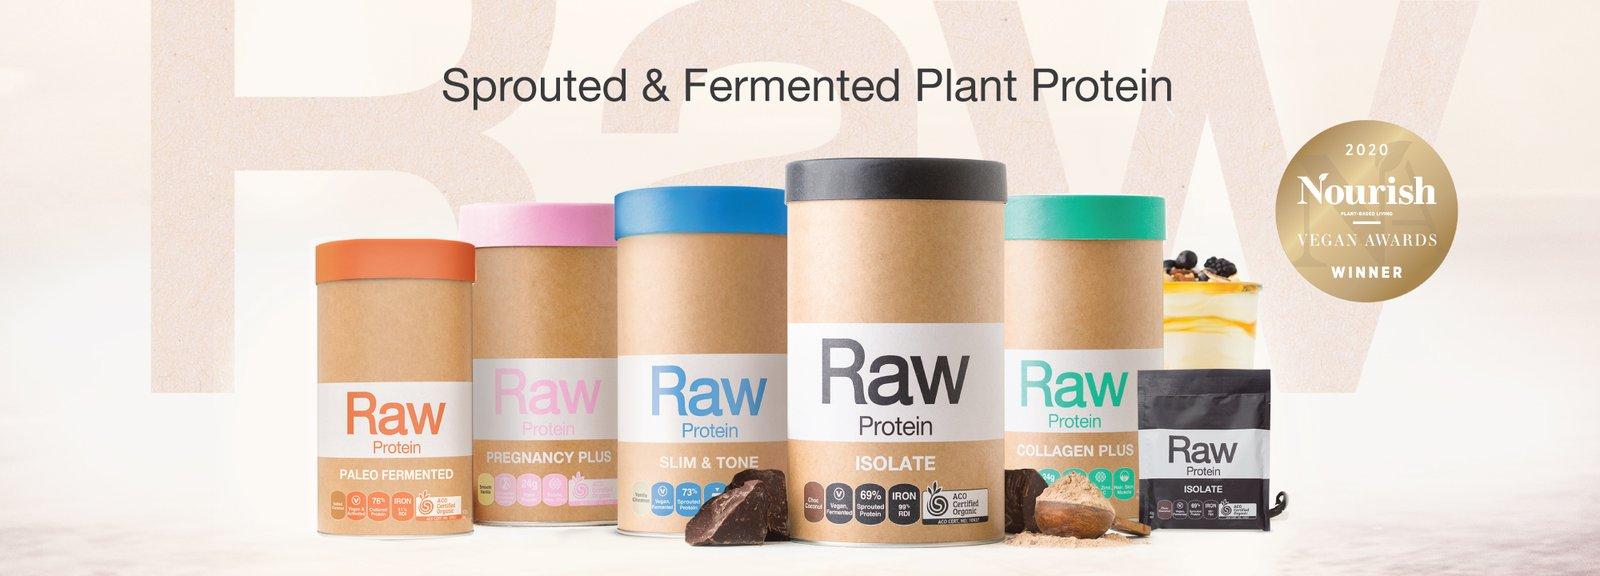 homepage-banners-raw-proteins-range-2000x720px-feb21-1baf69ed-483d-488d-b8da-07585ce88b21-1600x.jpg